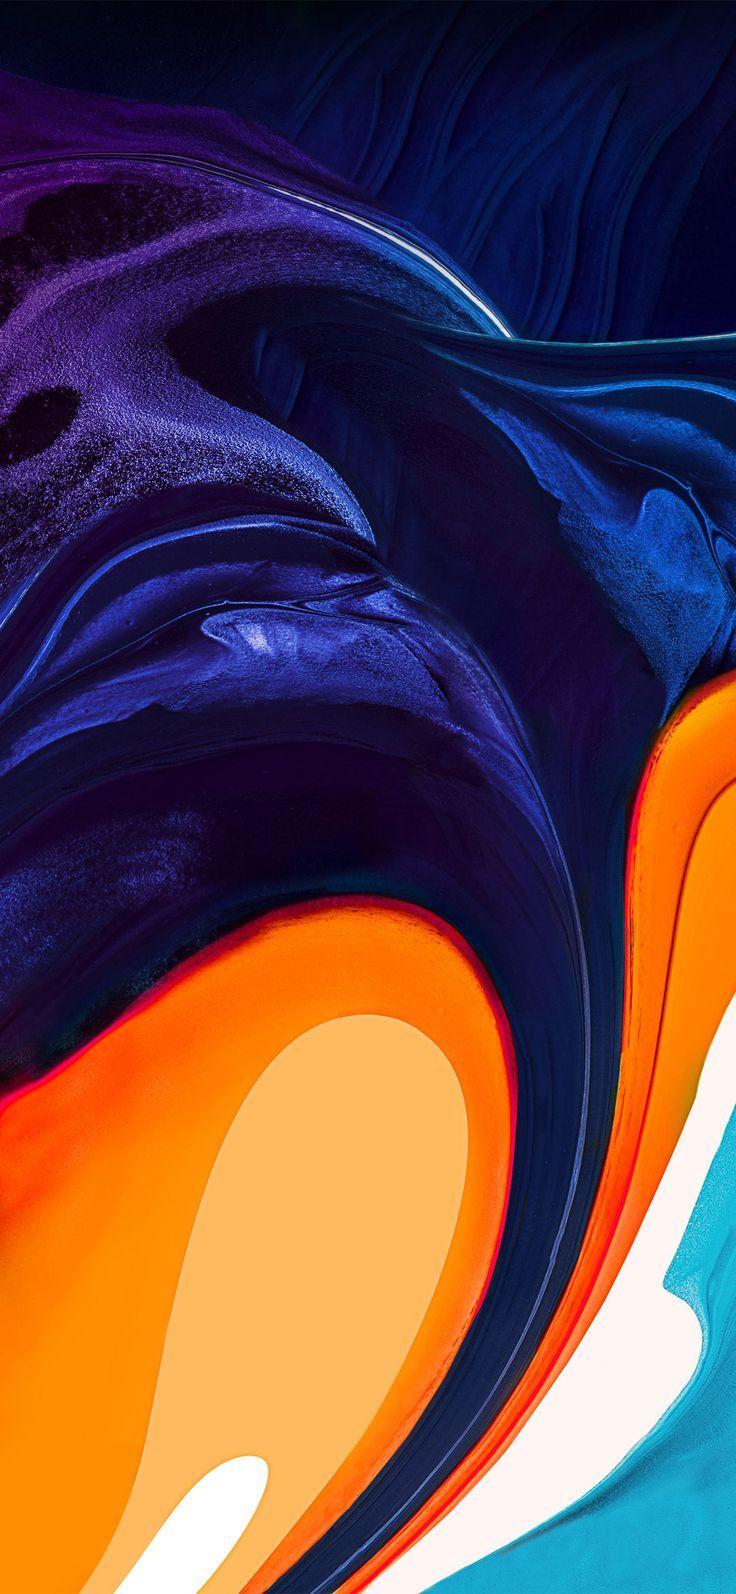 Samsung Galaxy A60 Wallpaper YTECHB Exclusive  Hd phone 736x1594